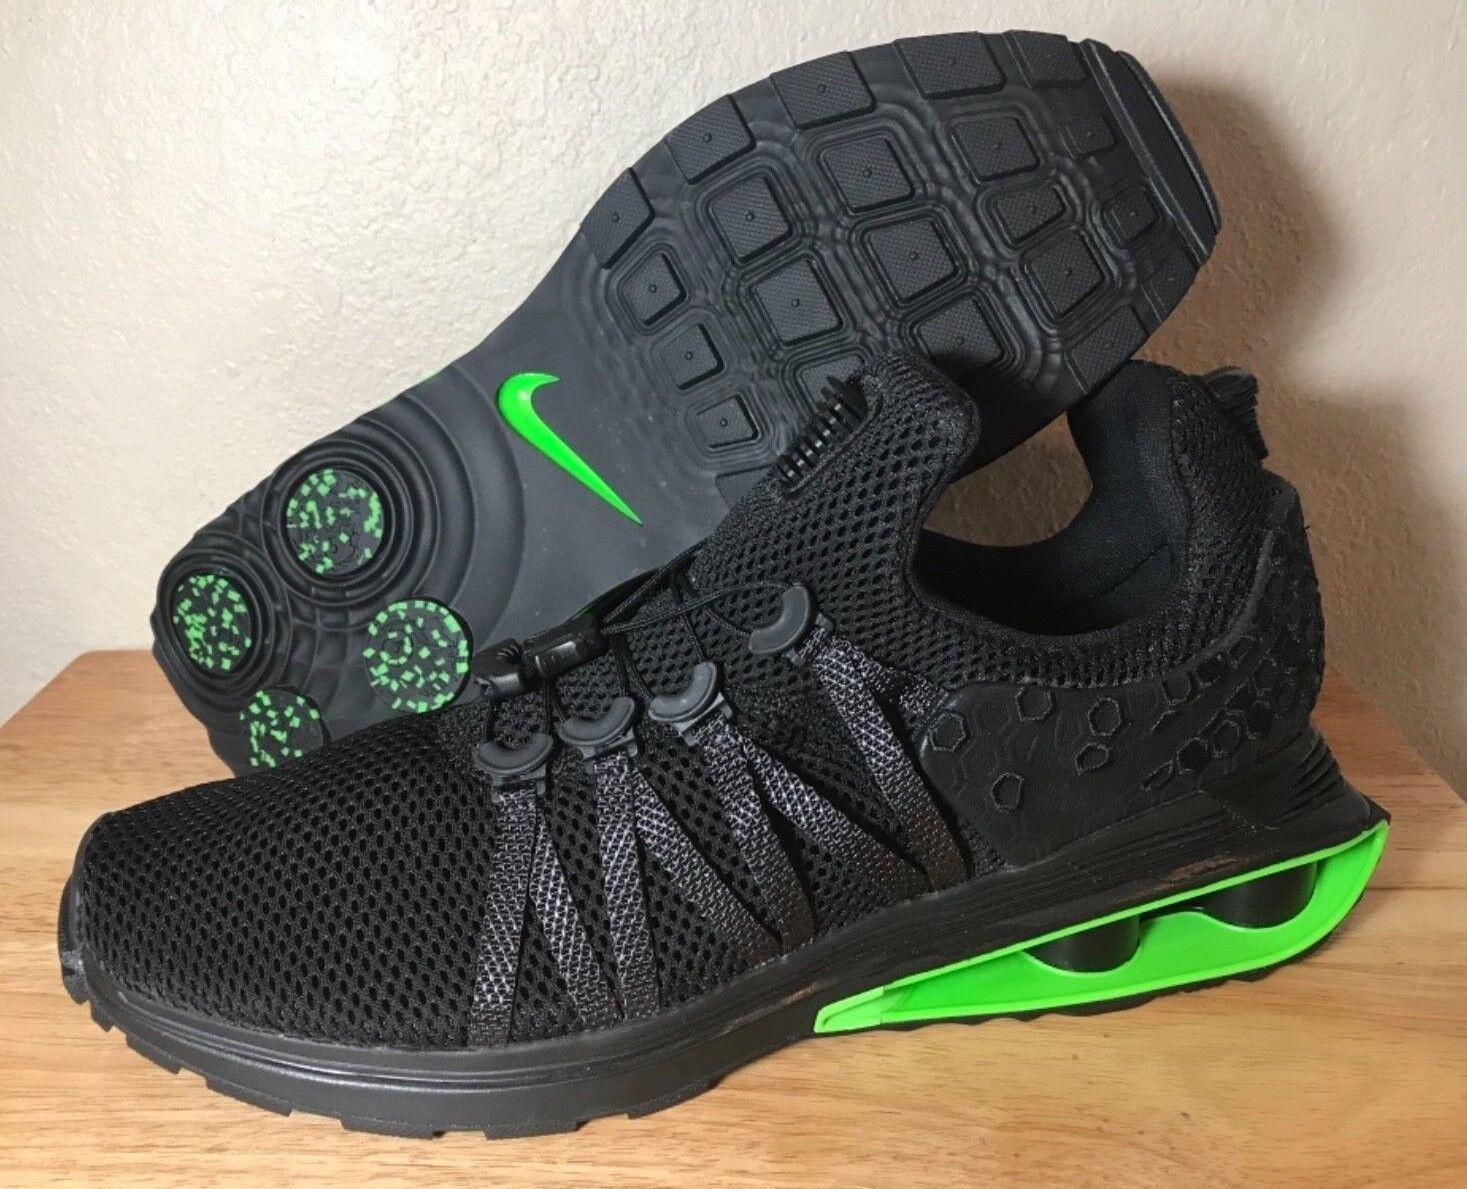 Nike Shox Gravity Luxe Black Green Strike Mens Running shoes SZ New AR1470-003